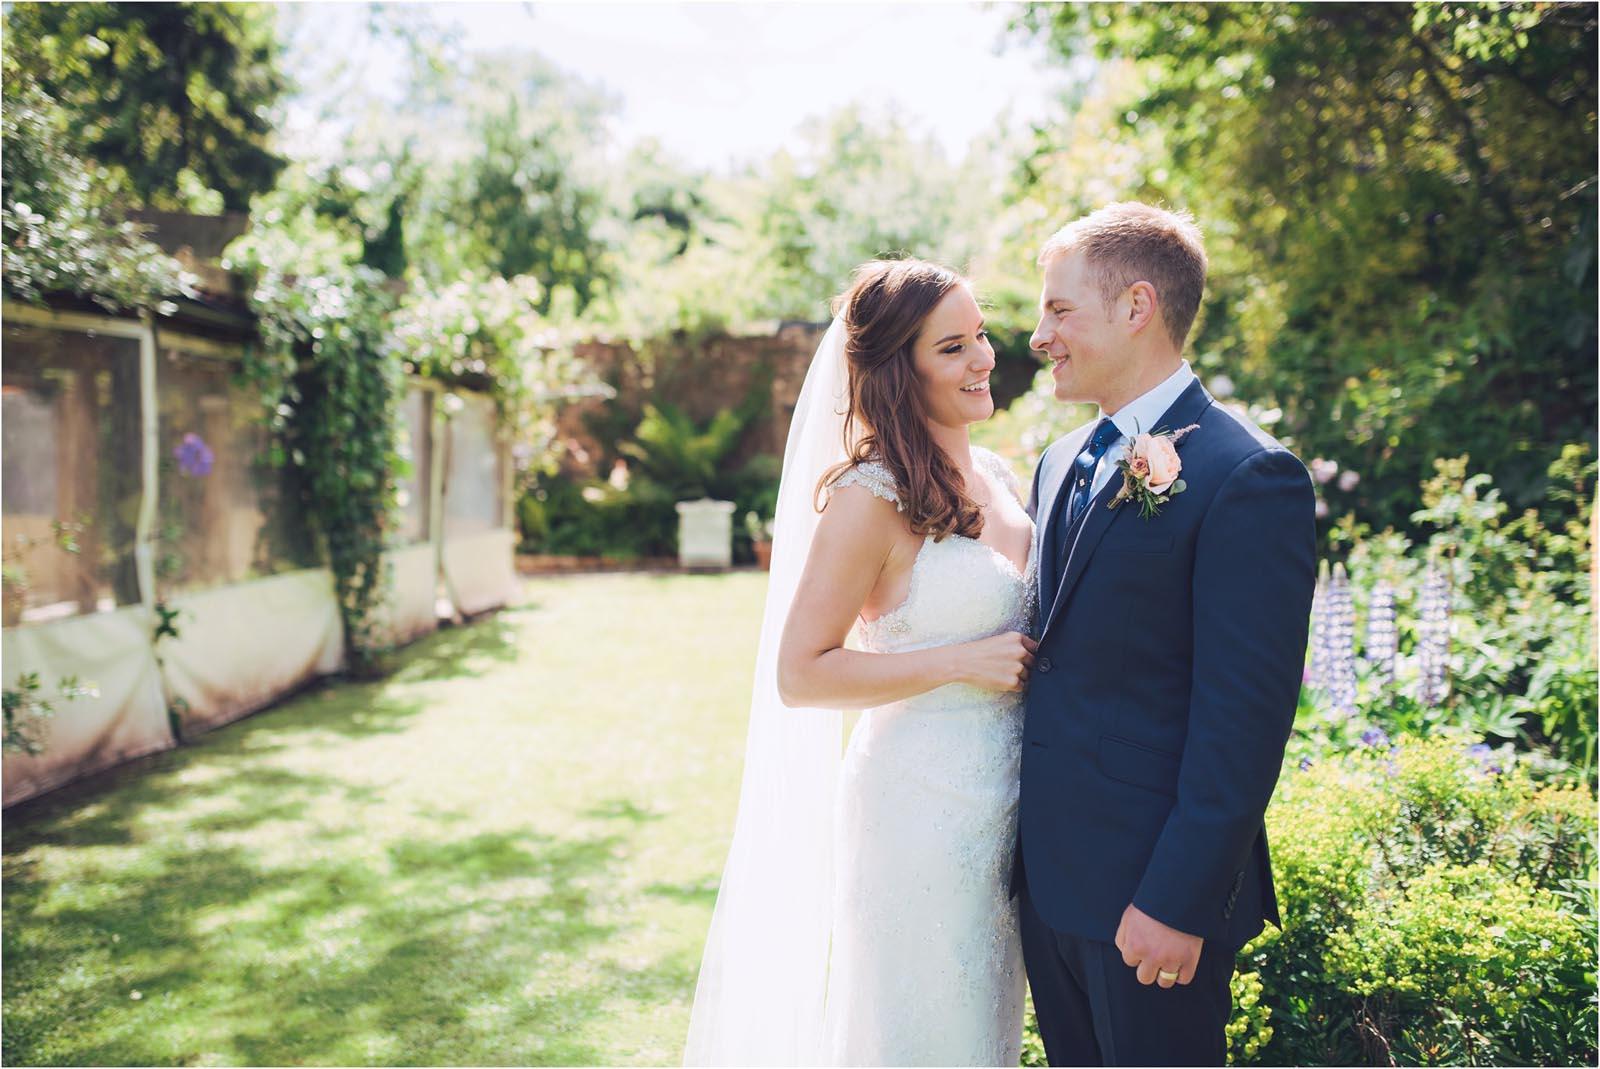 Simon biffen wedding photography 0090